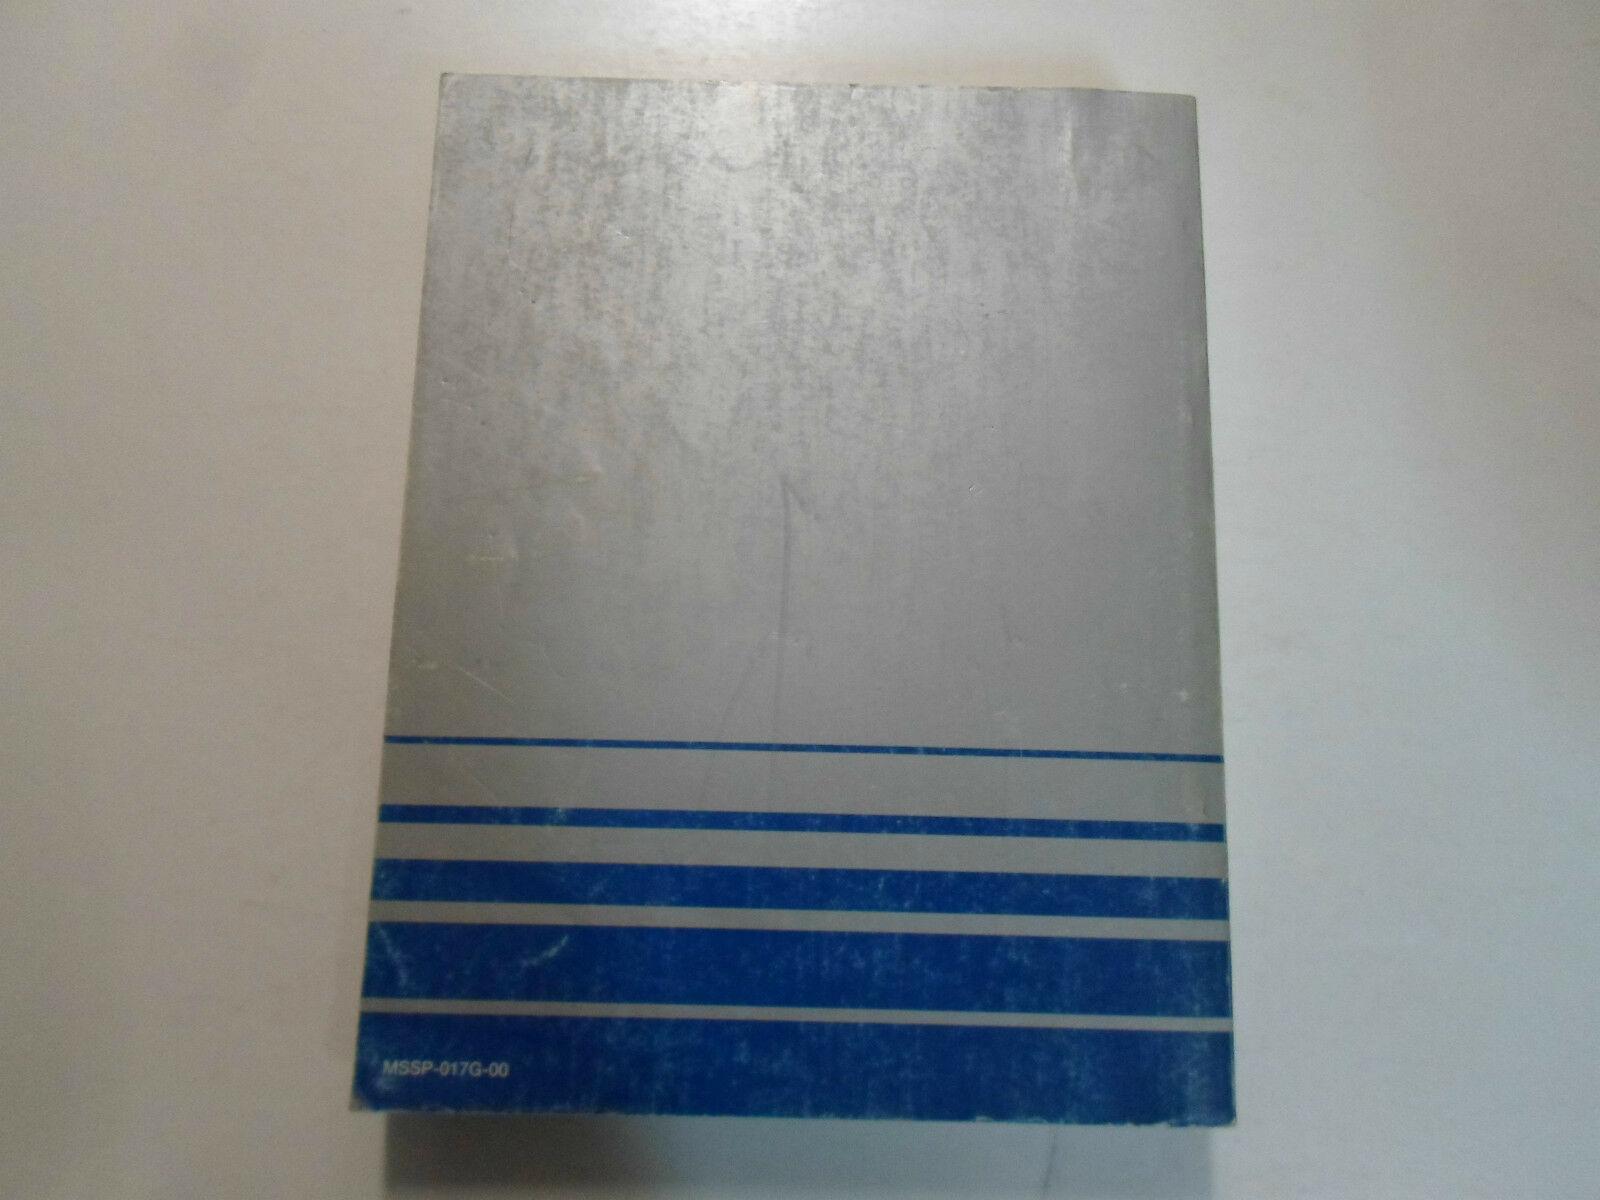 2000 Mitsubishi Technische Service Bulletins Reparatur Shop Manual Fabrik OEM 00